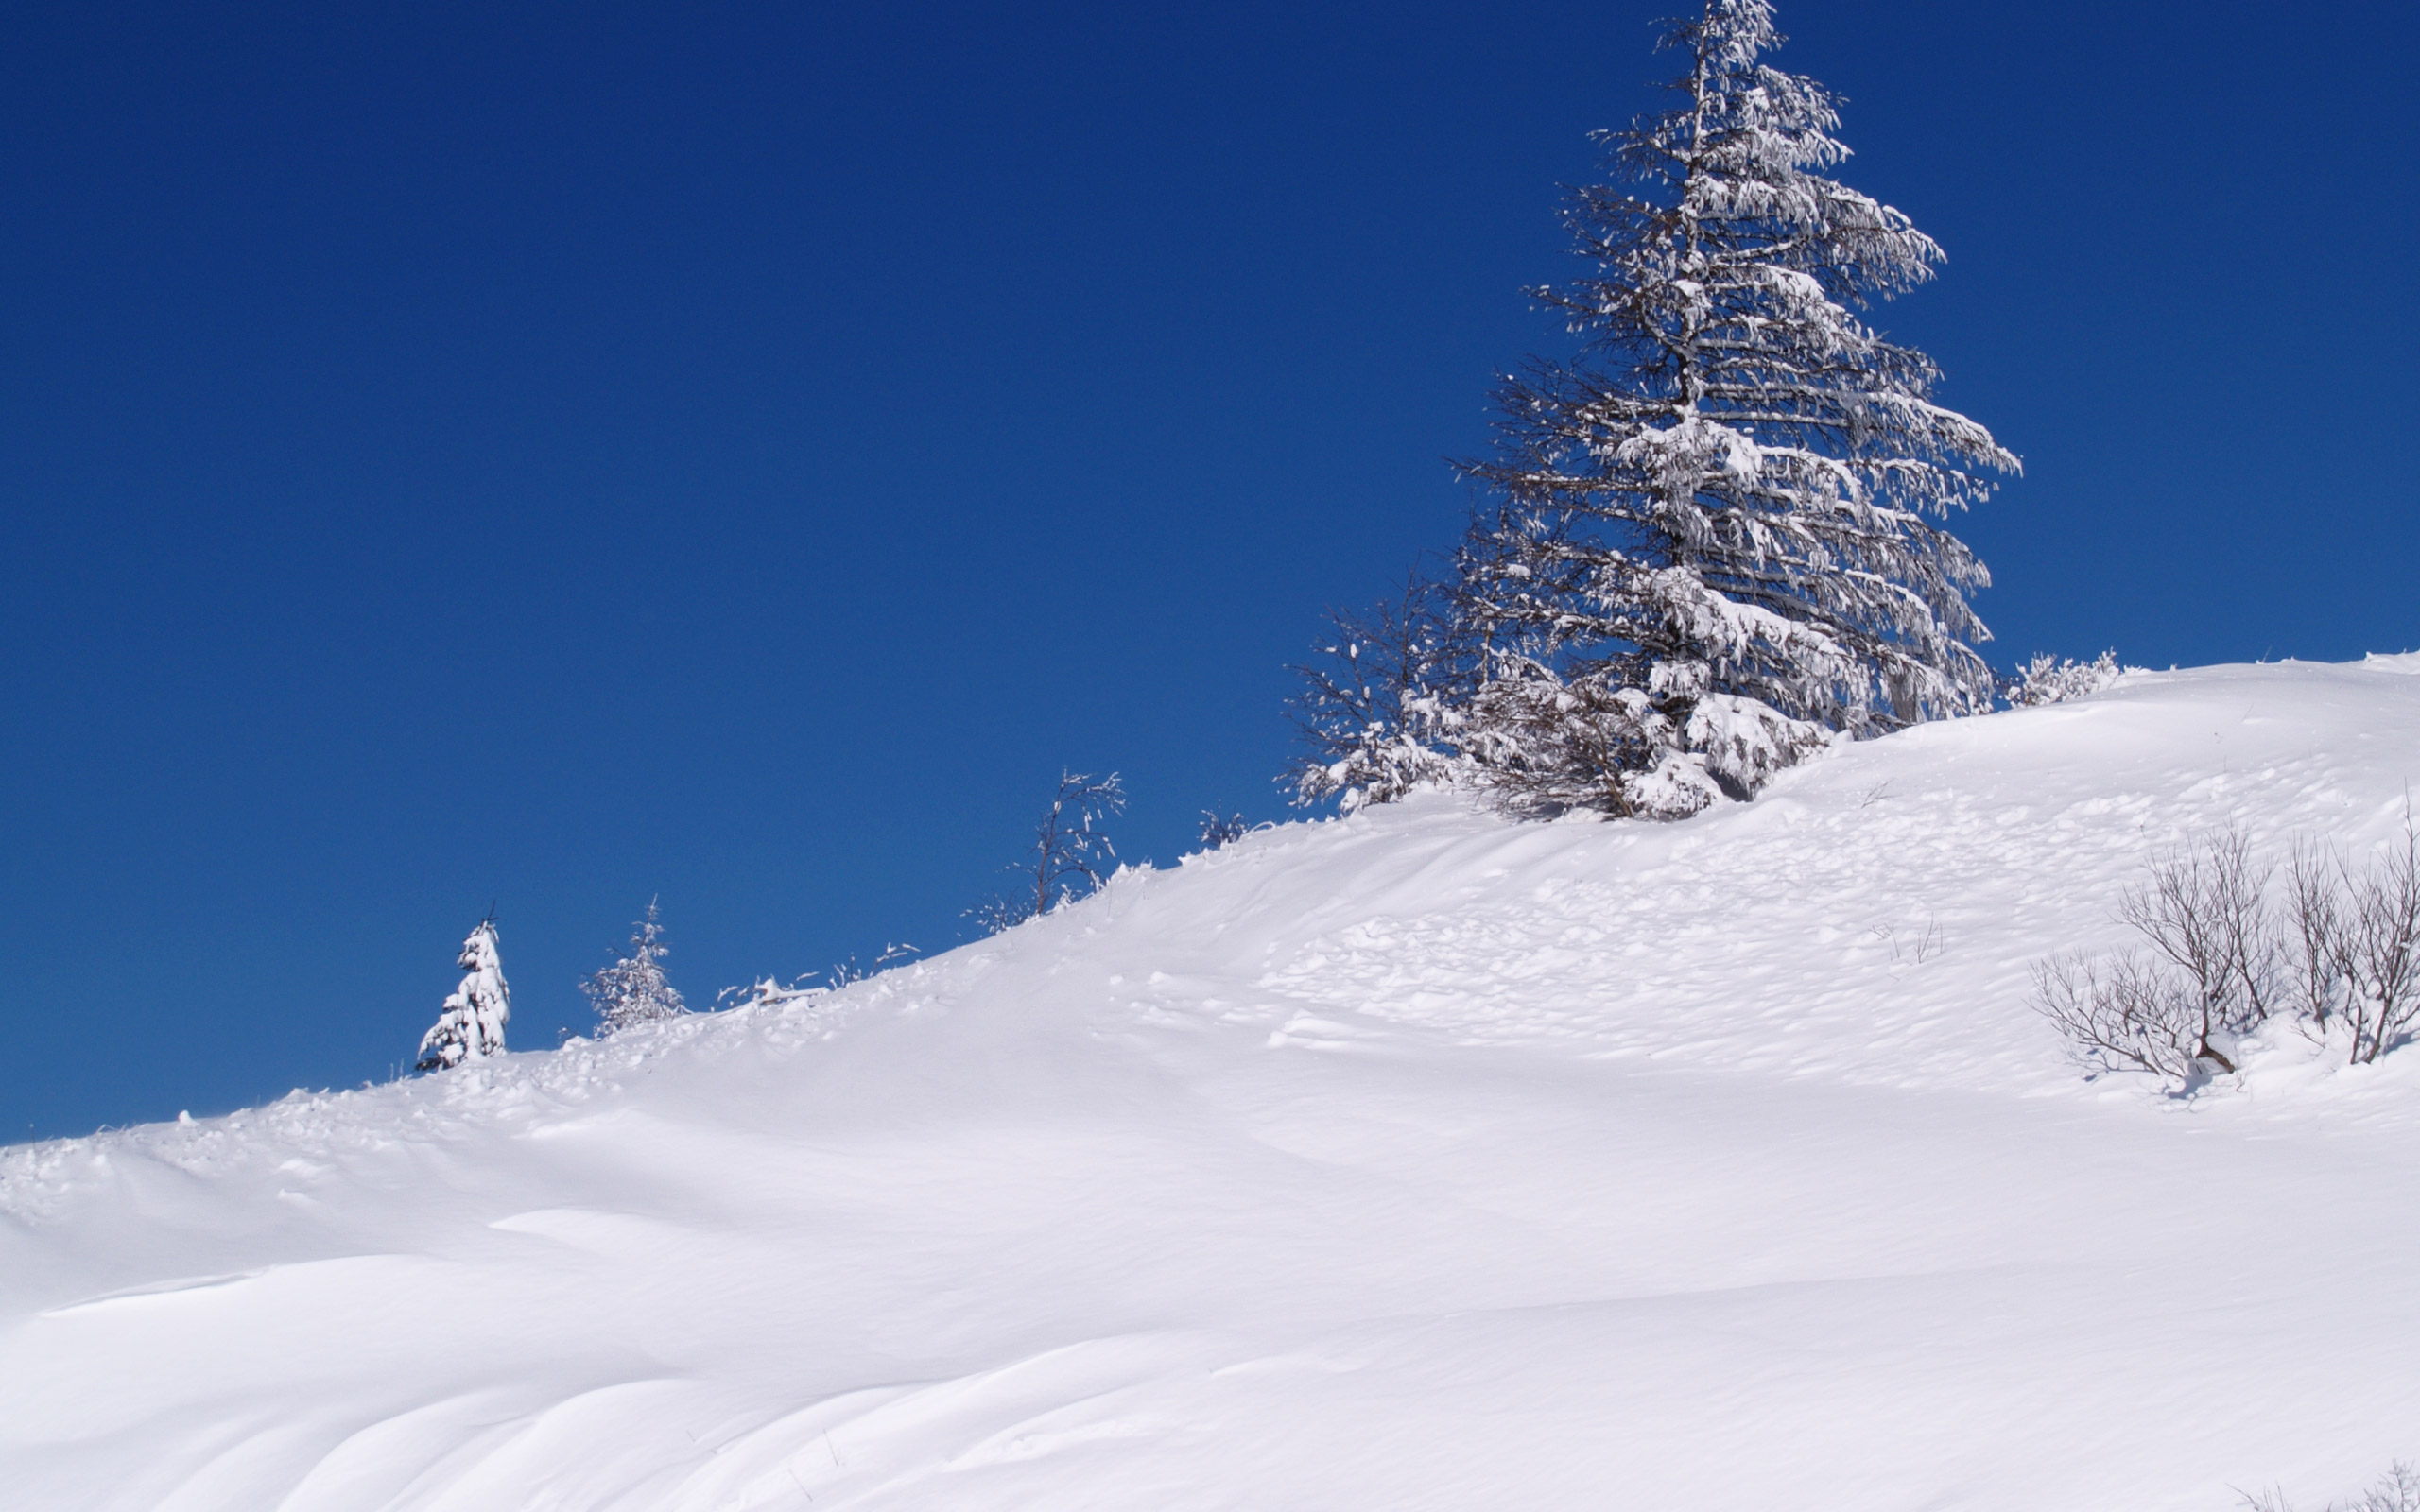 四季 冬の無料壁紙 冬の風景写真 高解像度 高画質